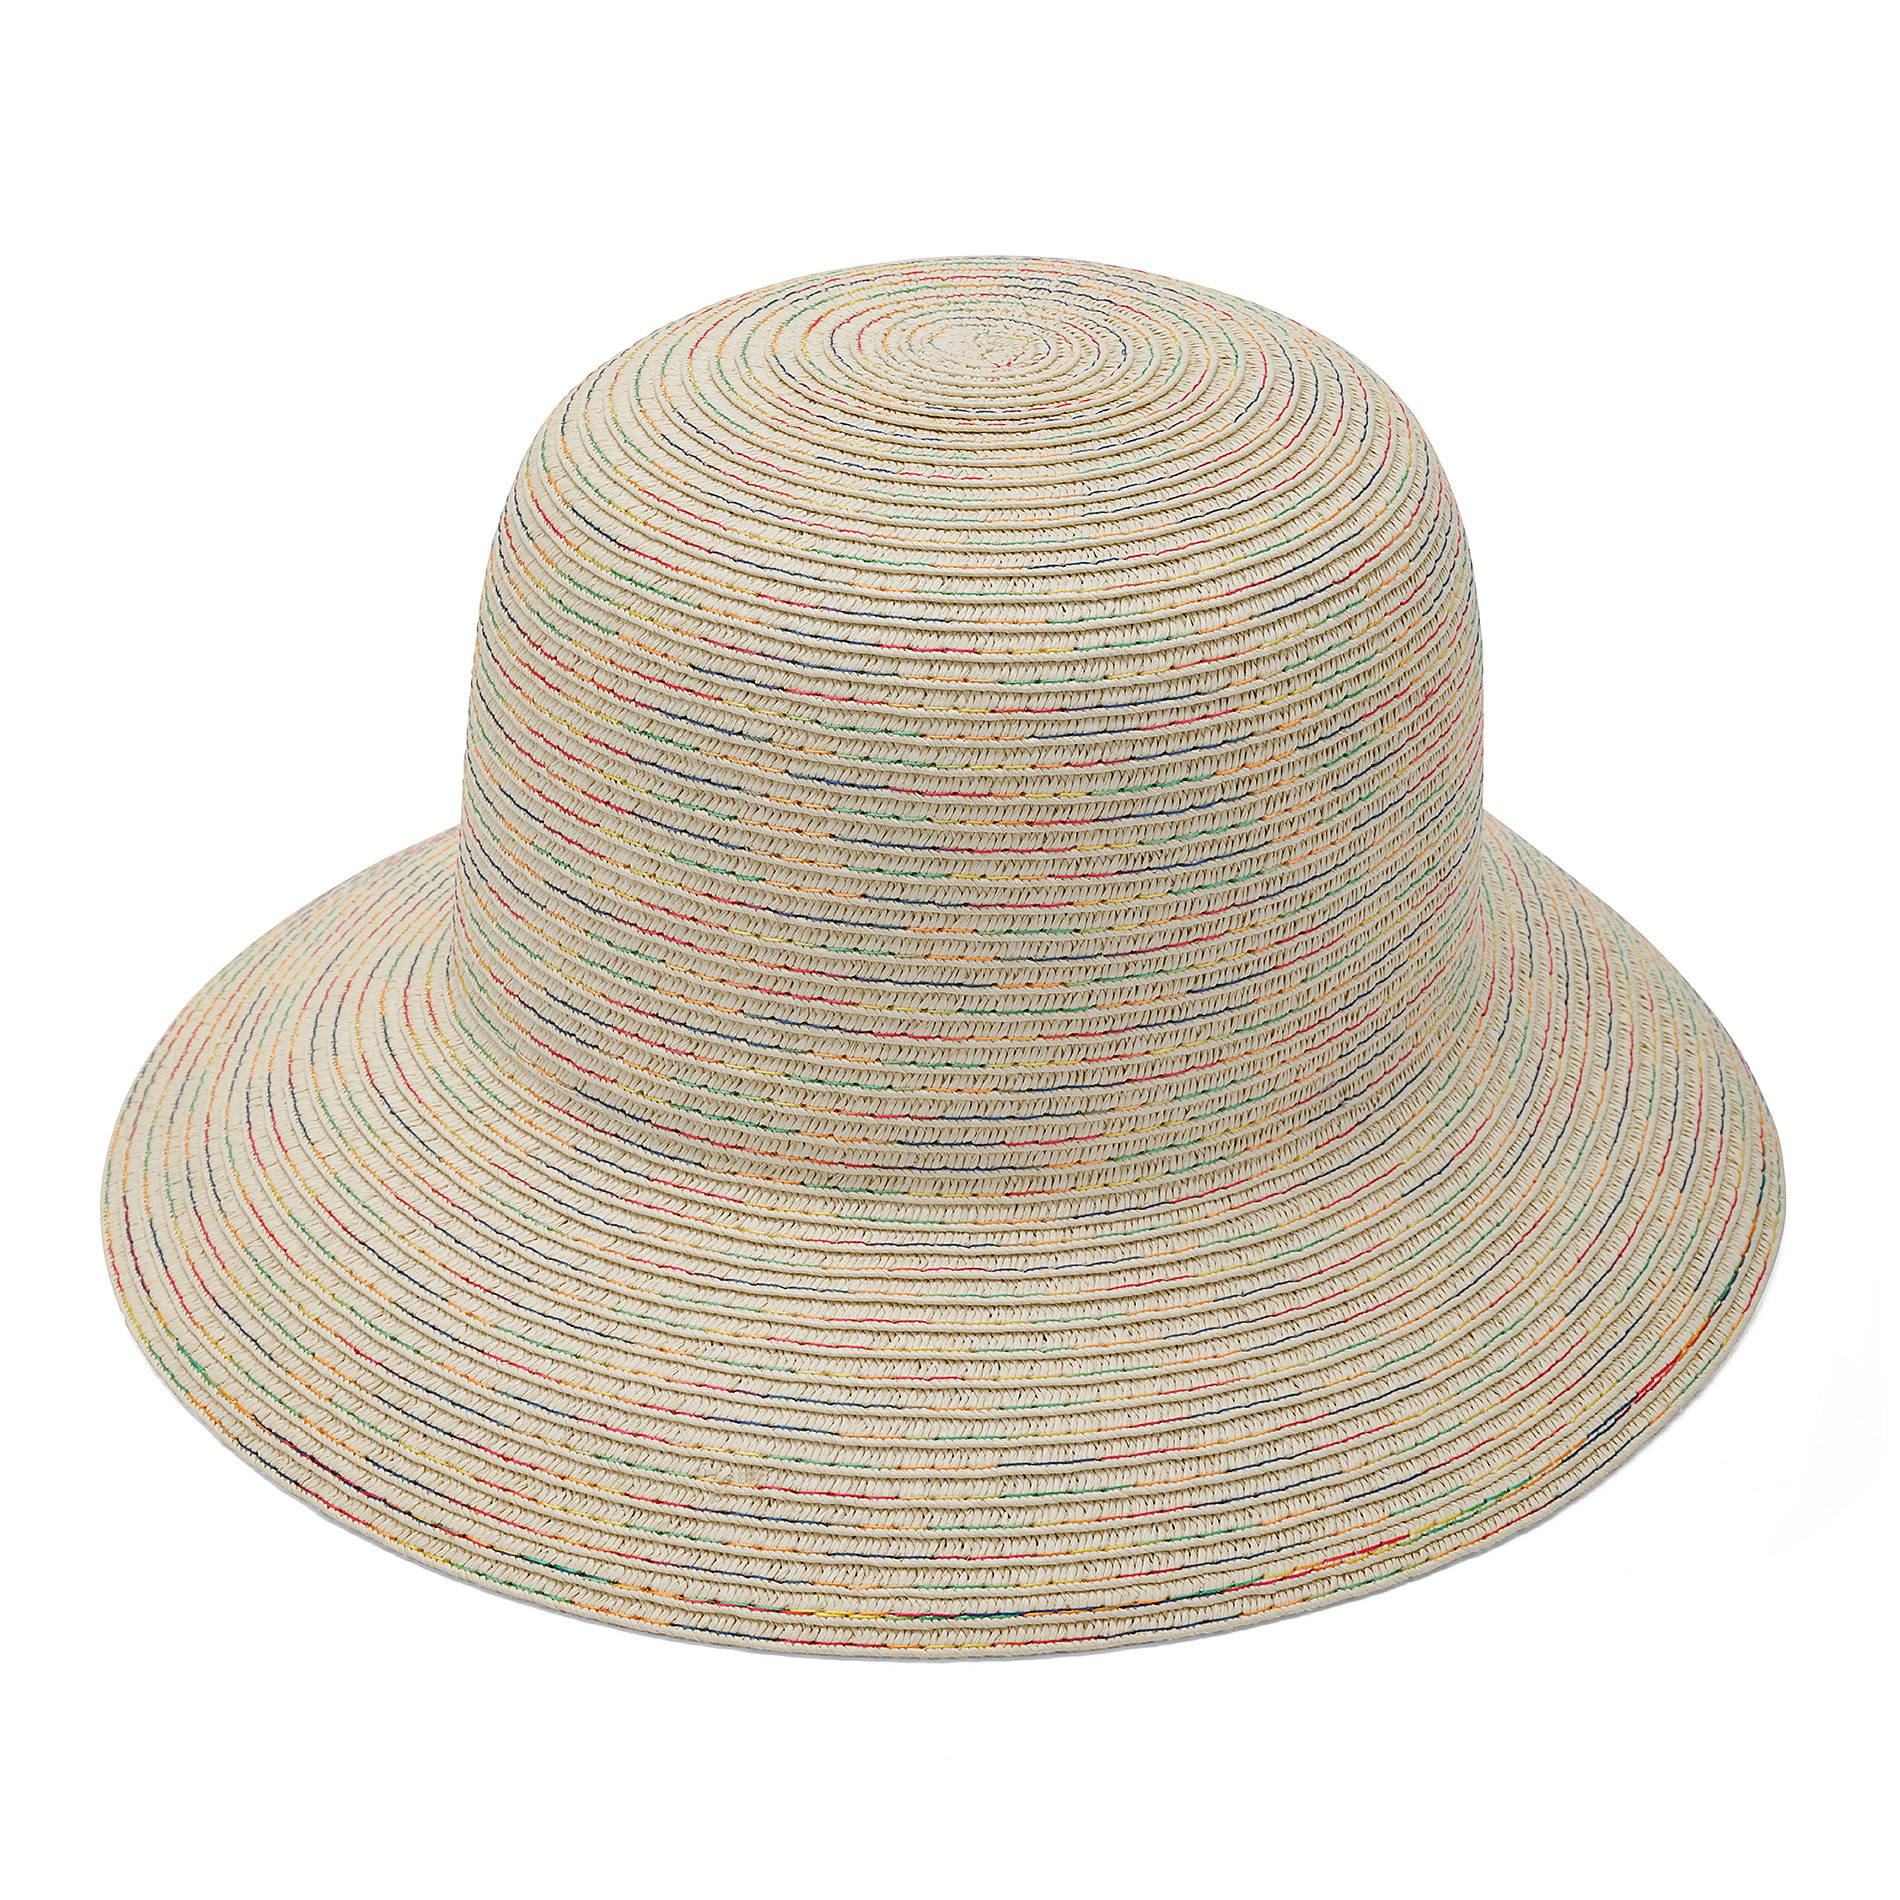 Cappello multicolore Koan, Beige chiaro, large image number 0